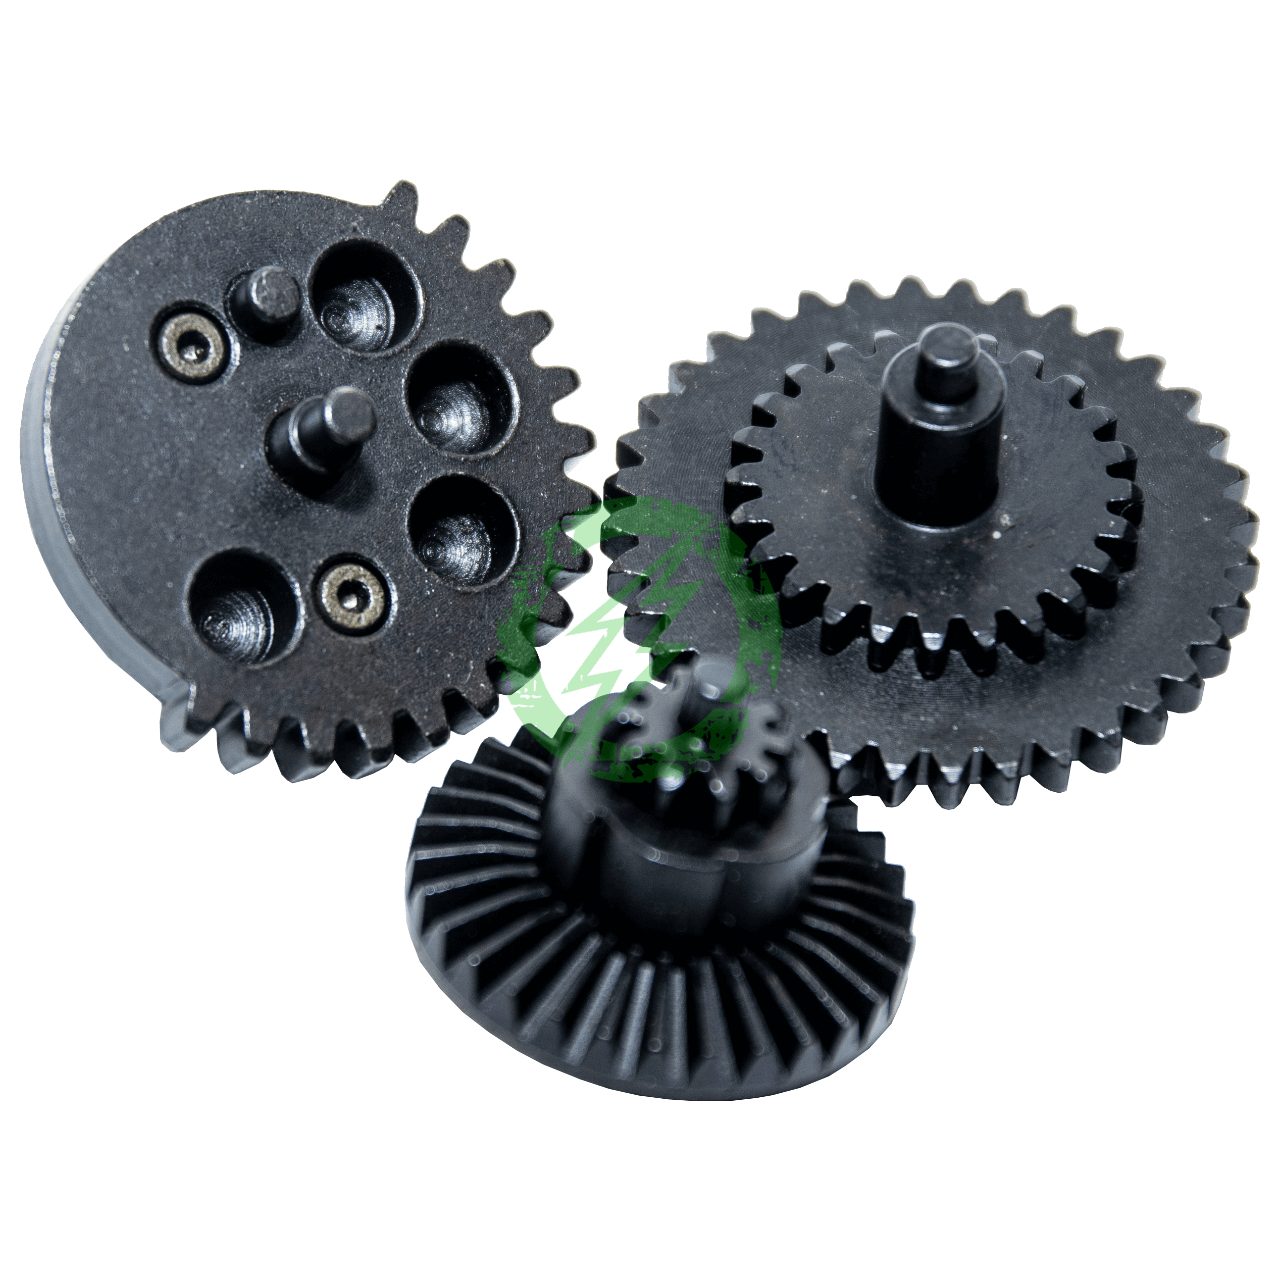 Rocket Airsoft CNC Gear Sets | 12:1